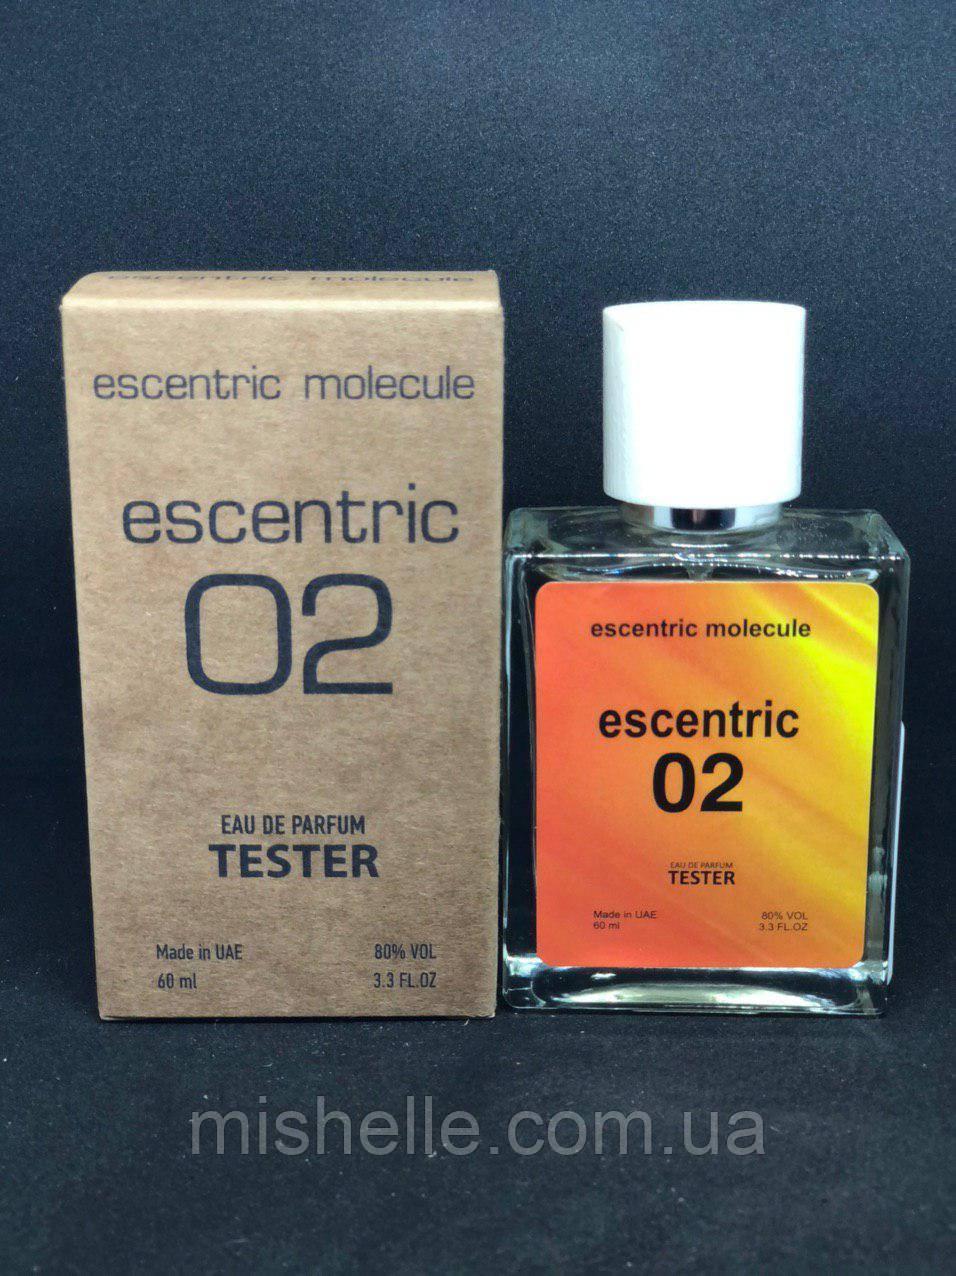 Тестер Escentric Molecules Escentric 02 (Эсцентрик Молекула Эсцентрик 02 60мл)